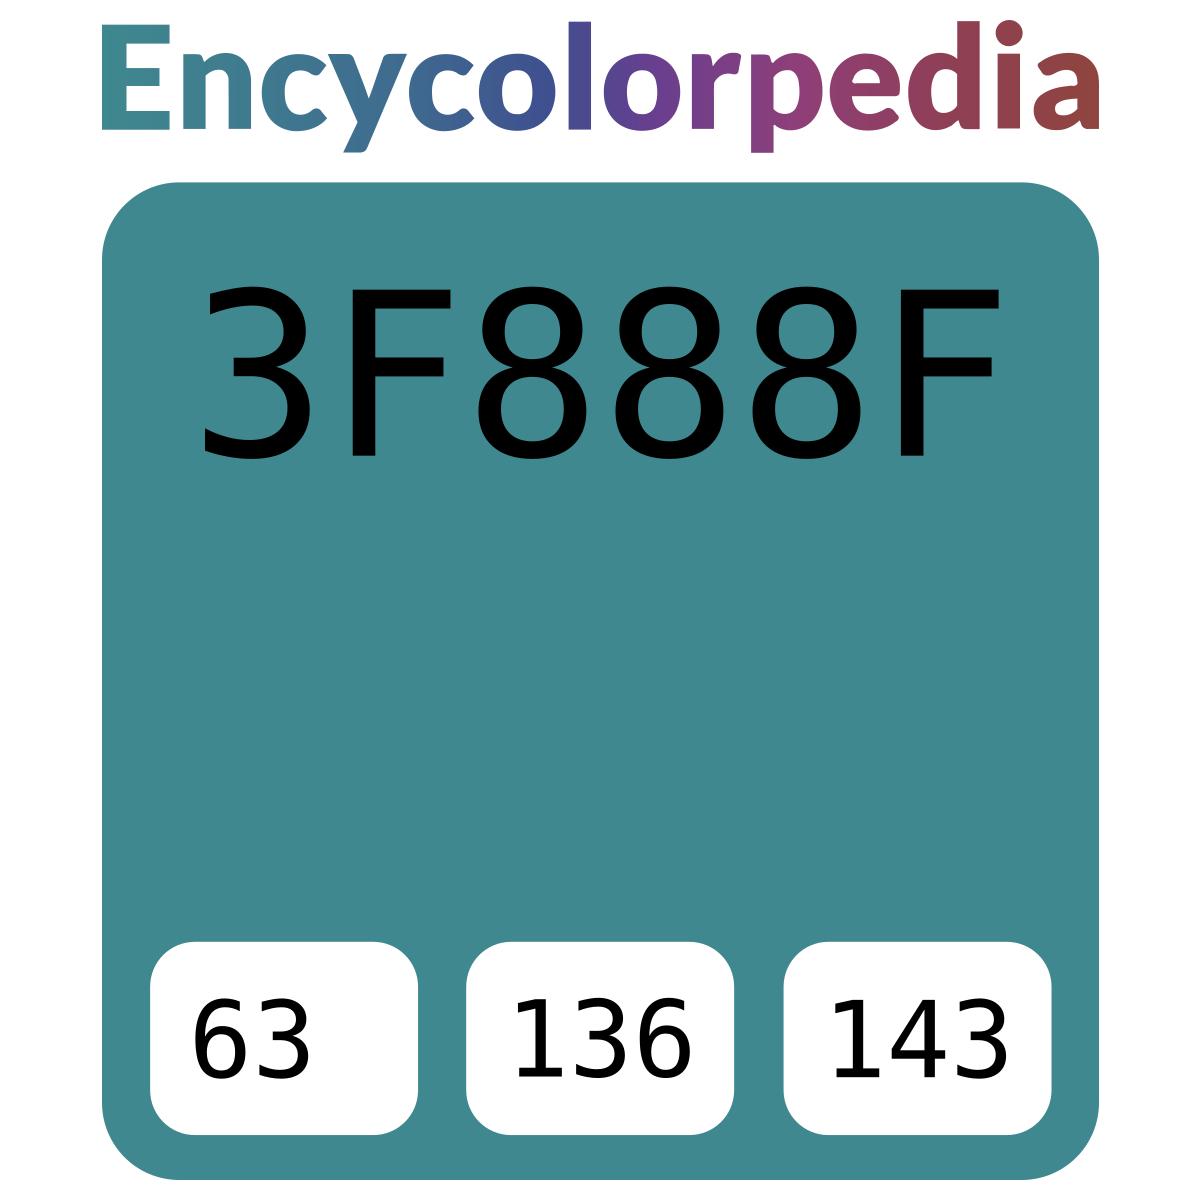 3f888f Schémas De Couleurs Hexadécimal Et Peintures